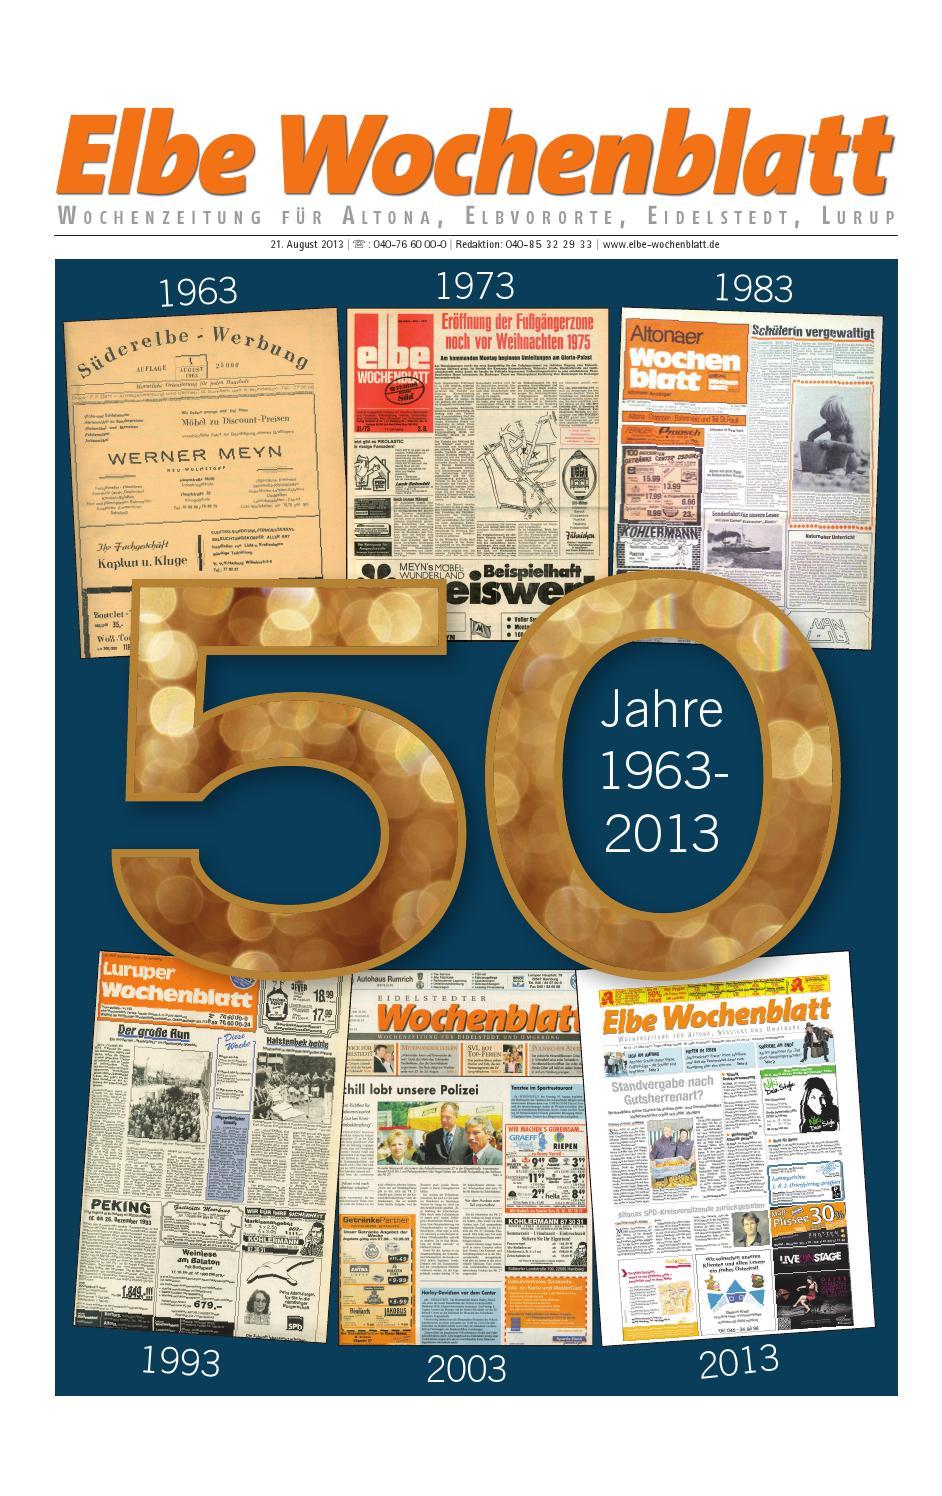 Elbe 50 West by Elbe Wochenblatt Verlagsgesellschaft mbH & Co.KG - issuu